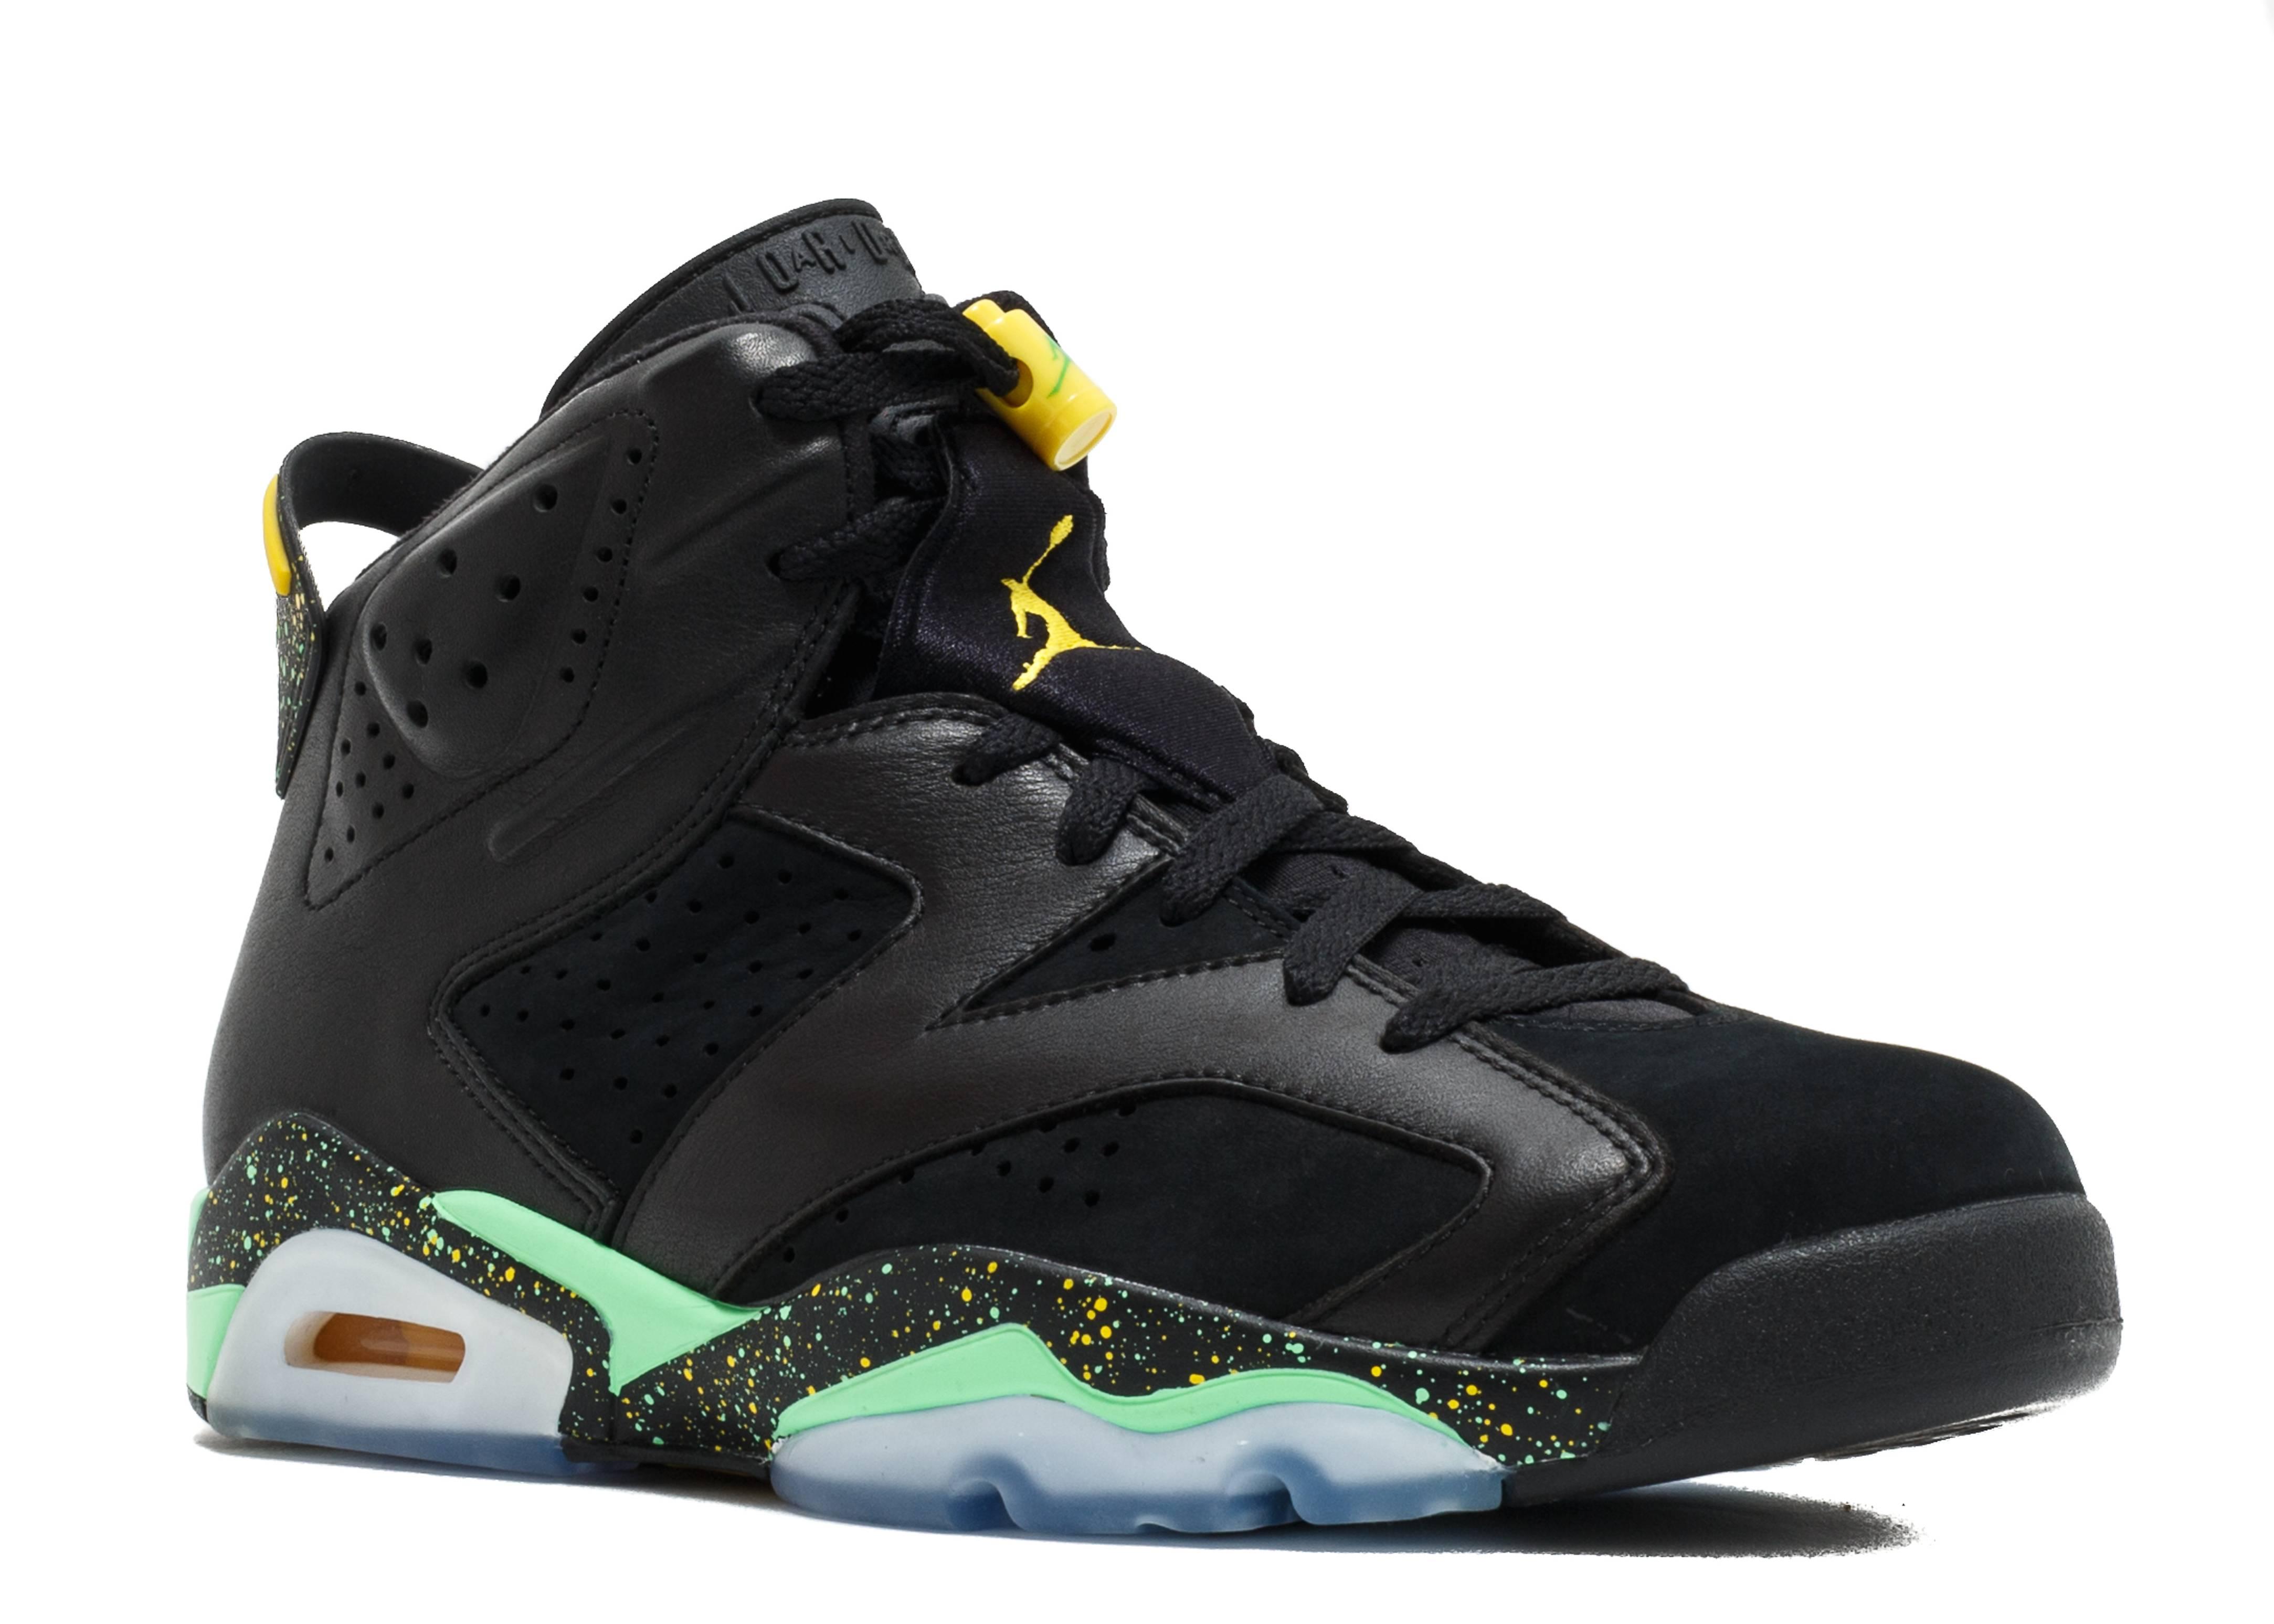 Air Jordan X (10) Retro Black Green